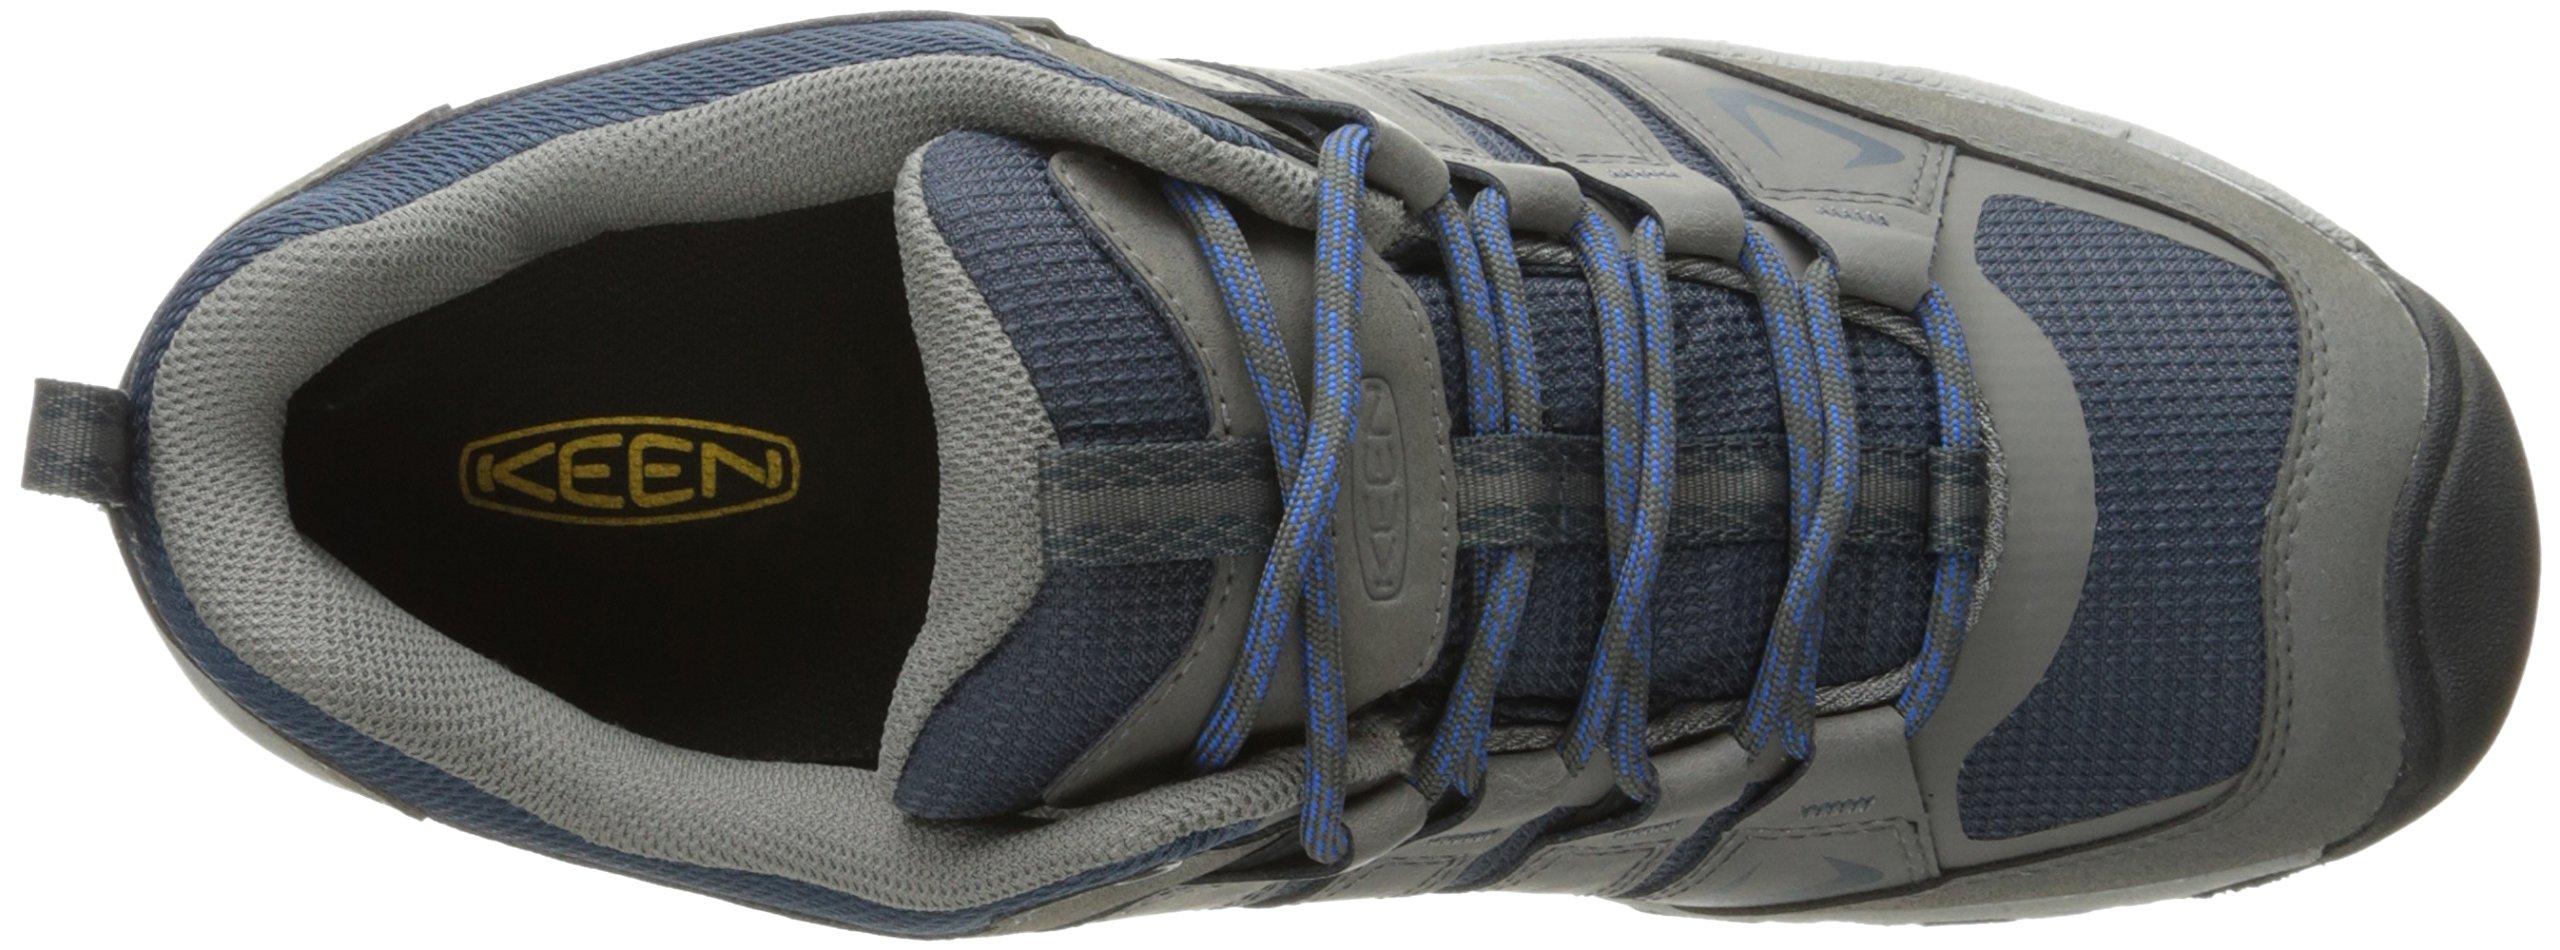 5b3351b0f05 KEEN Men s Oakridge Waterproof Shoe - oakridge wp-m-m-Parent   Hiking Shoes    Clothing